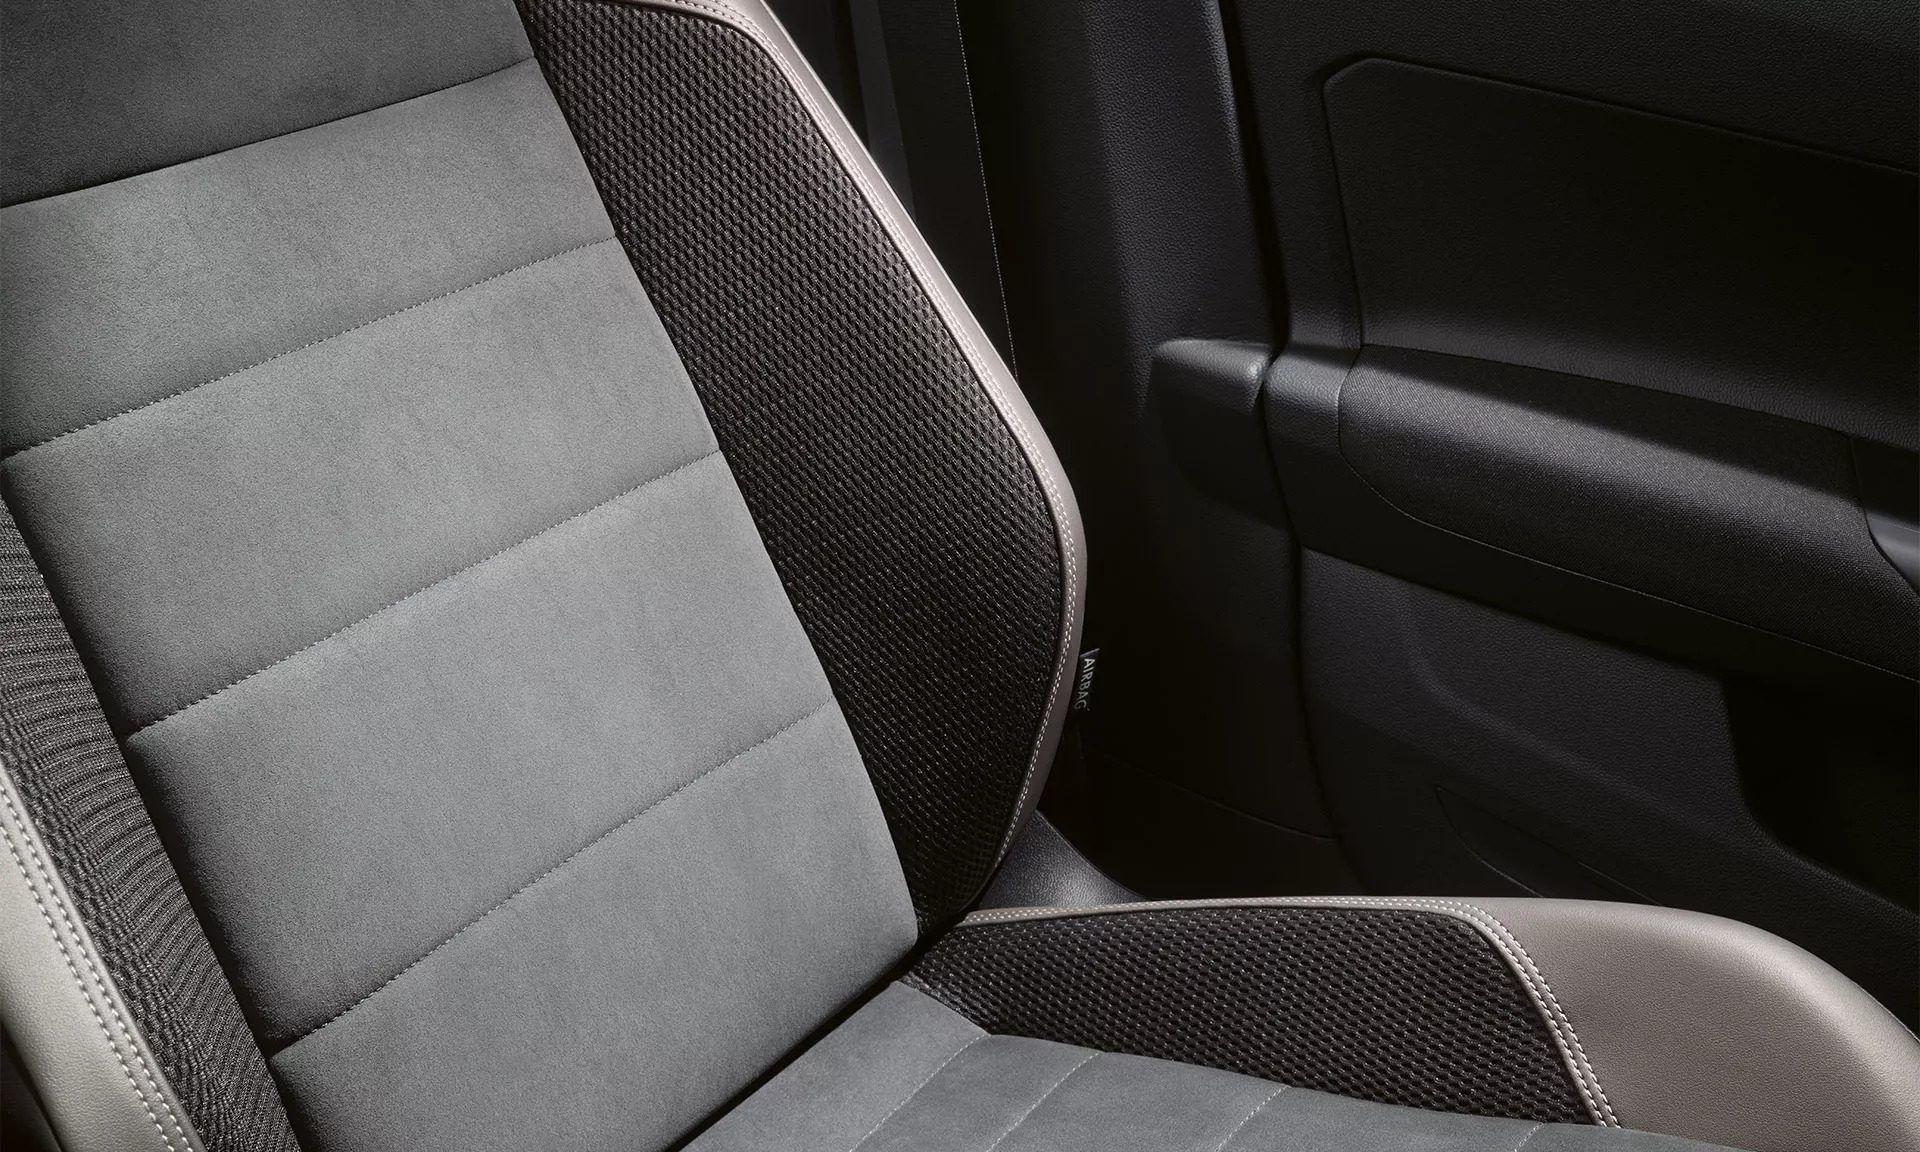 polo seat comfort